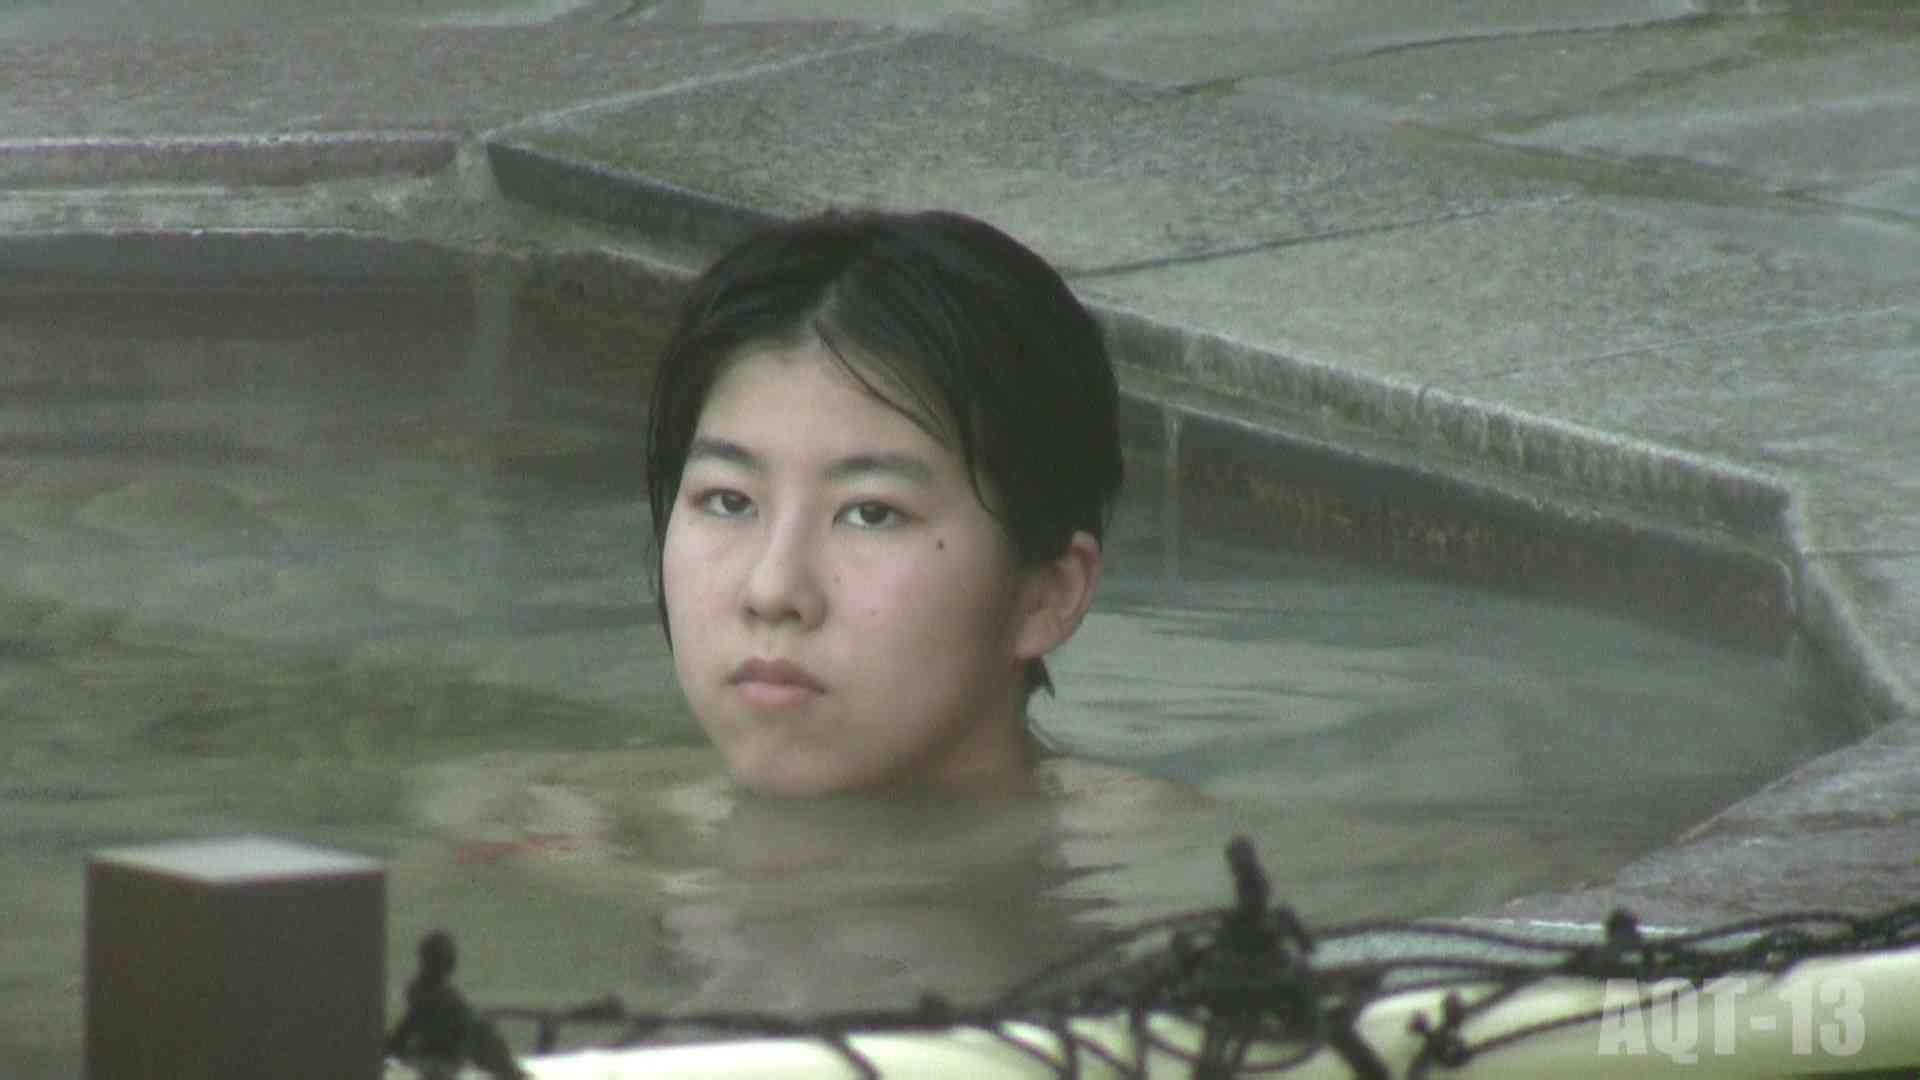 Aquaな露天風呂Vol.816 OLセックス | 露天  80画像 1